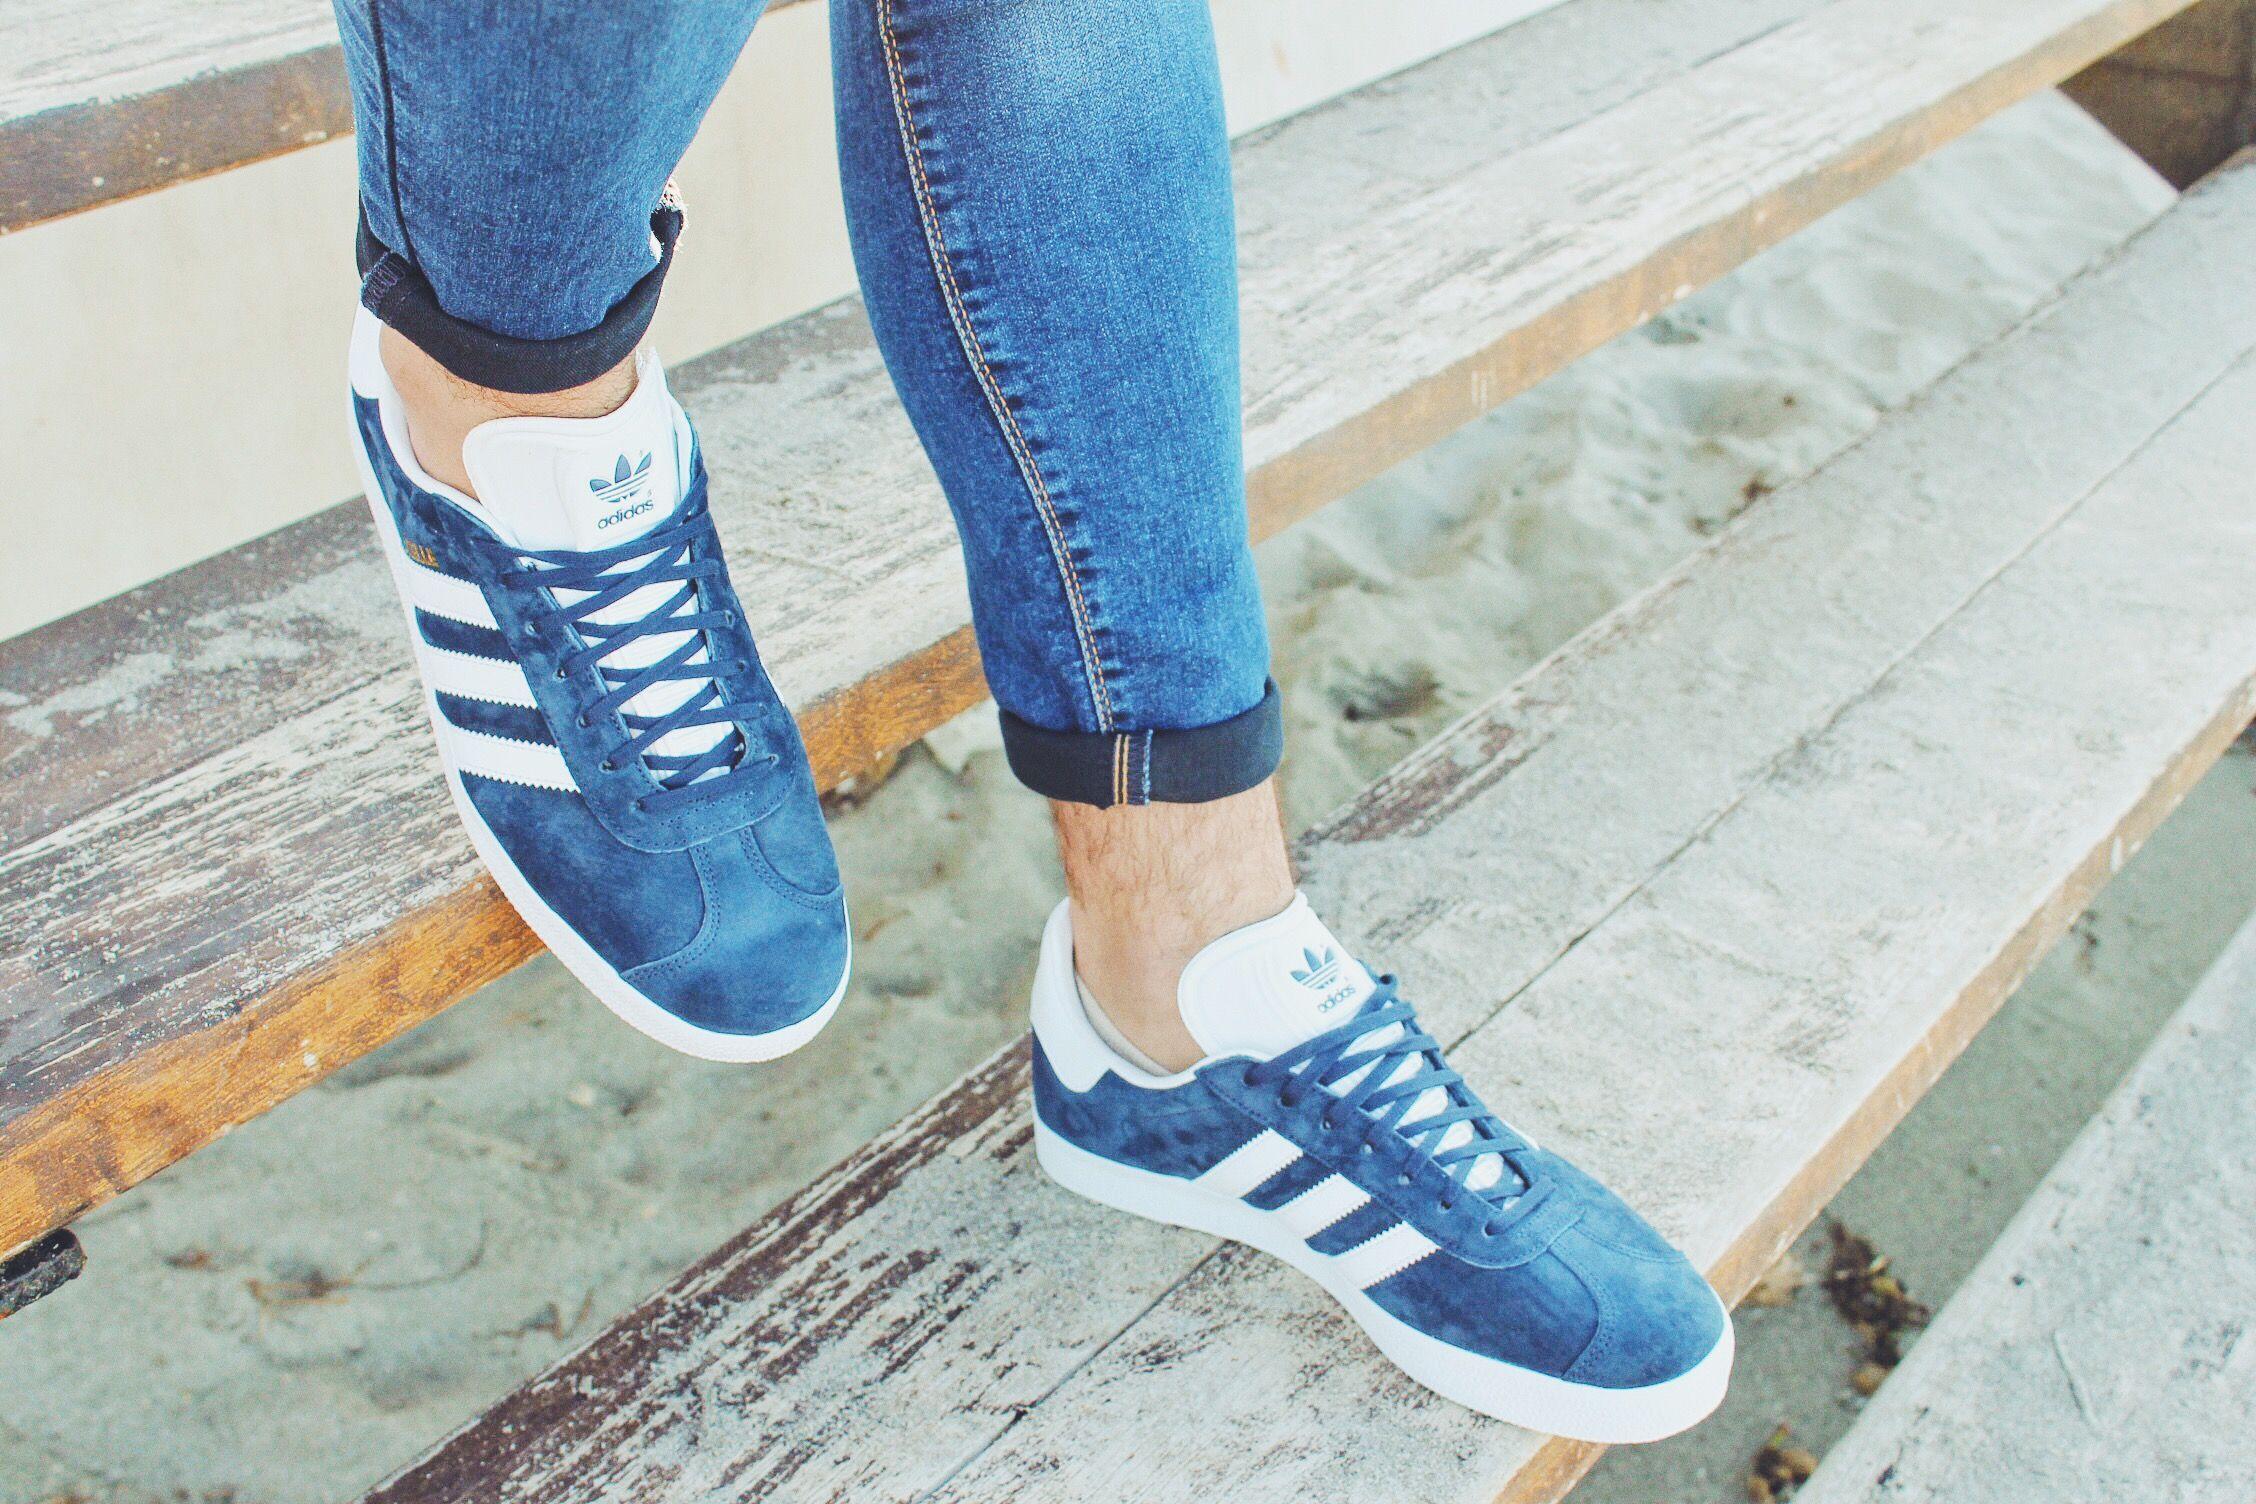 adidas shop online ukraine adidas gazelle red women sneakers